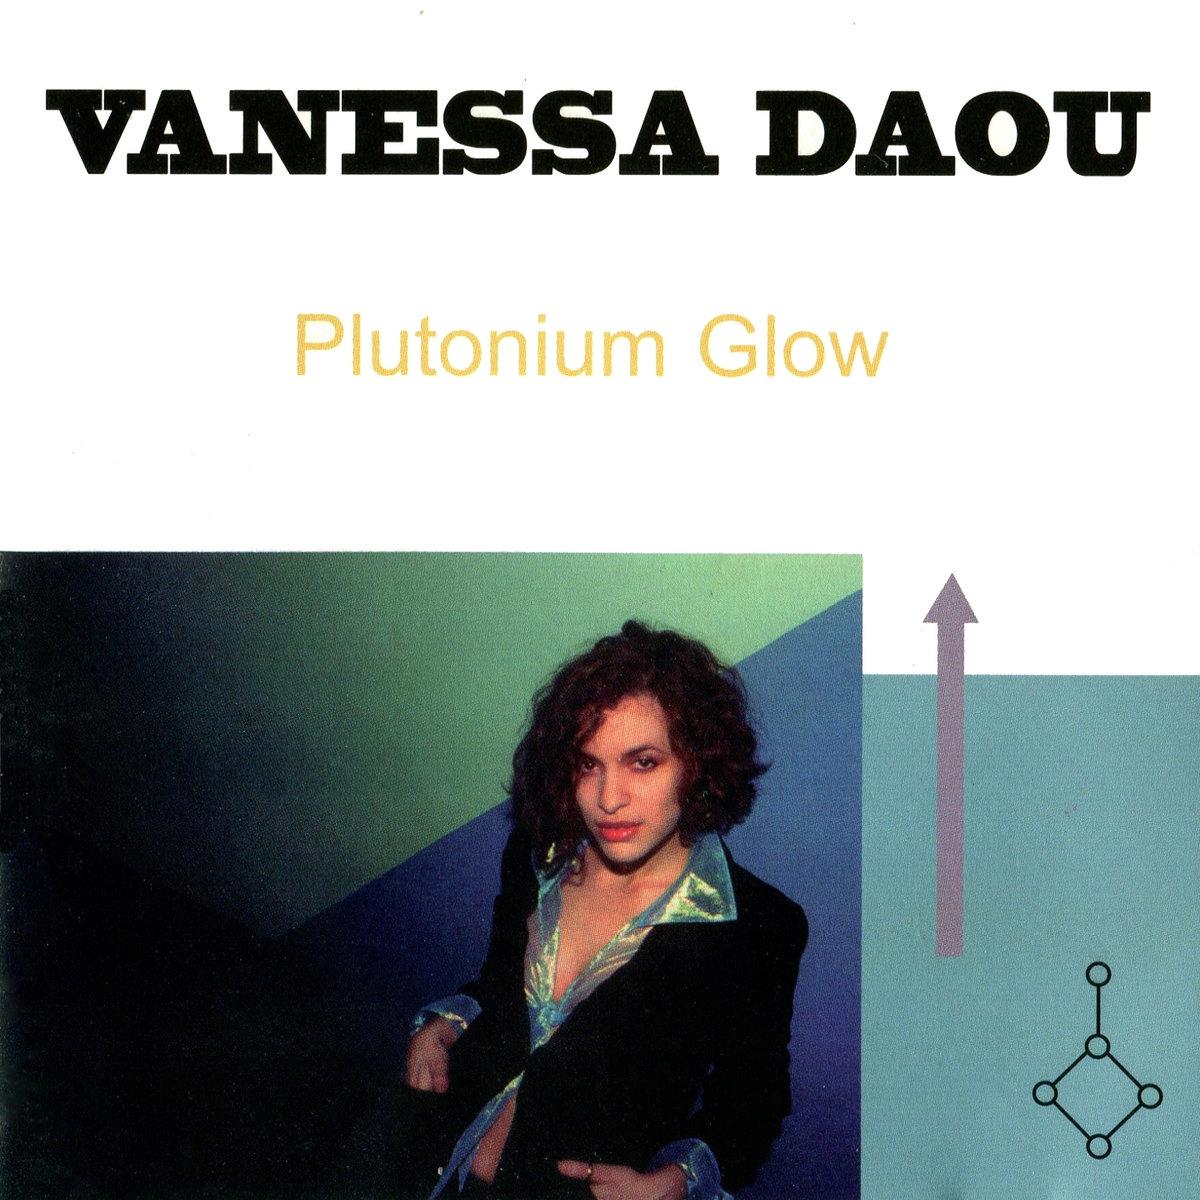 Vanessa DaouPlutonium Glow - OXYGEN MUSIC WORKS / DAOU MUSIC, 1998